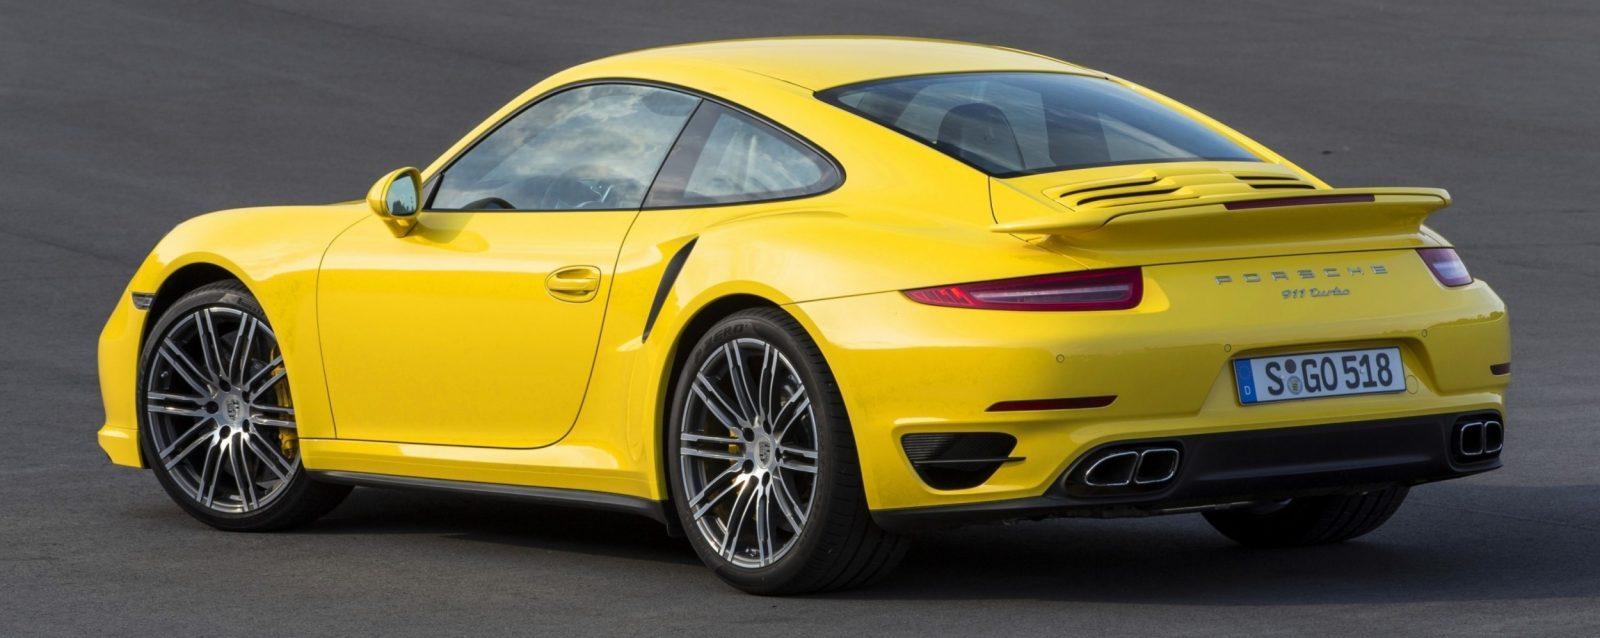 Porsche 911 Turbo _5_